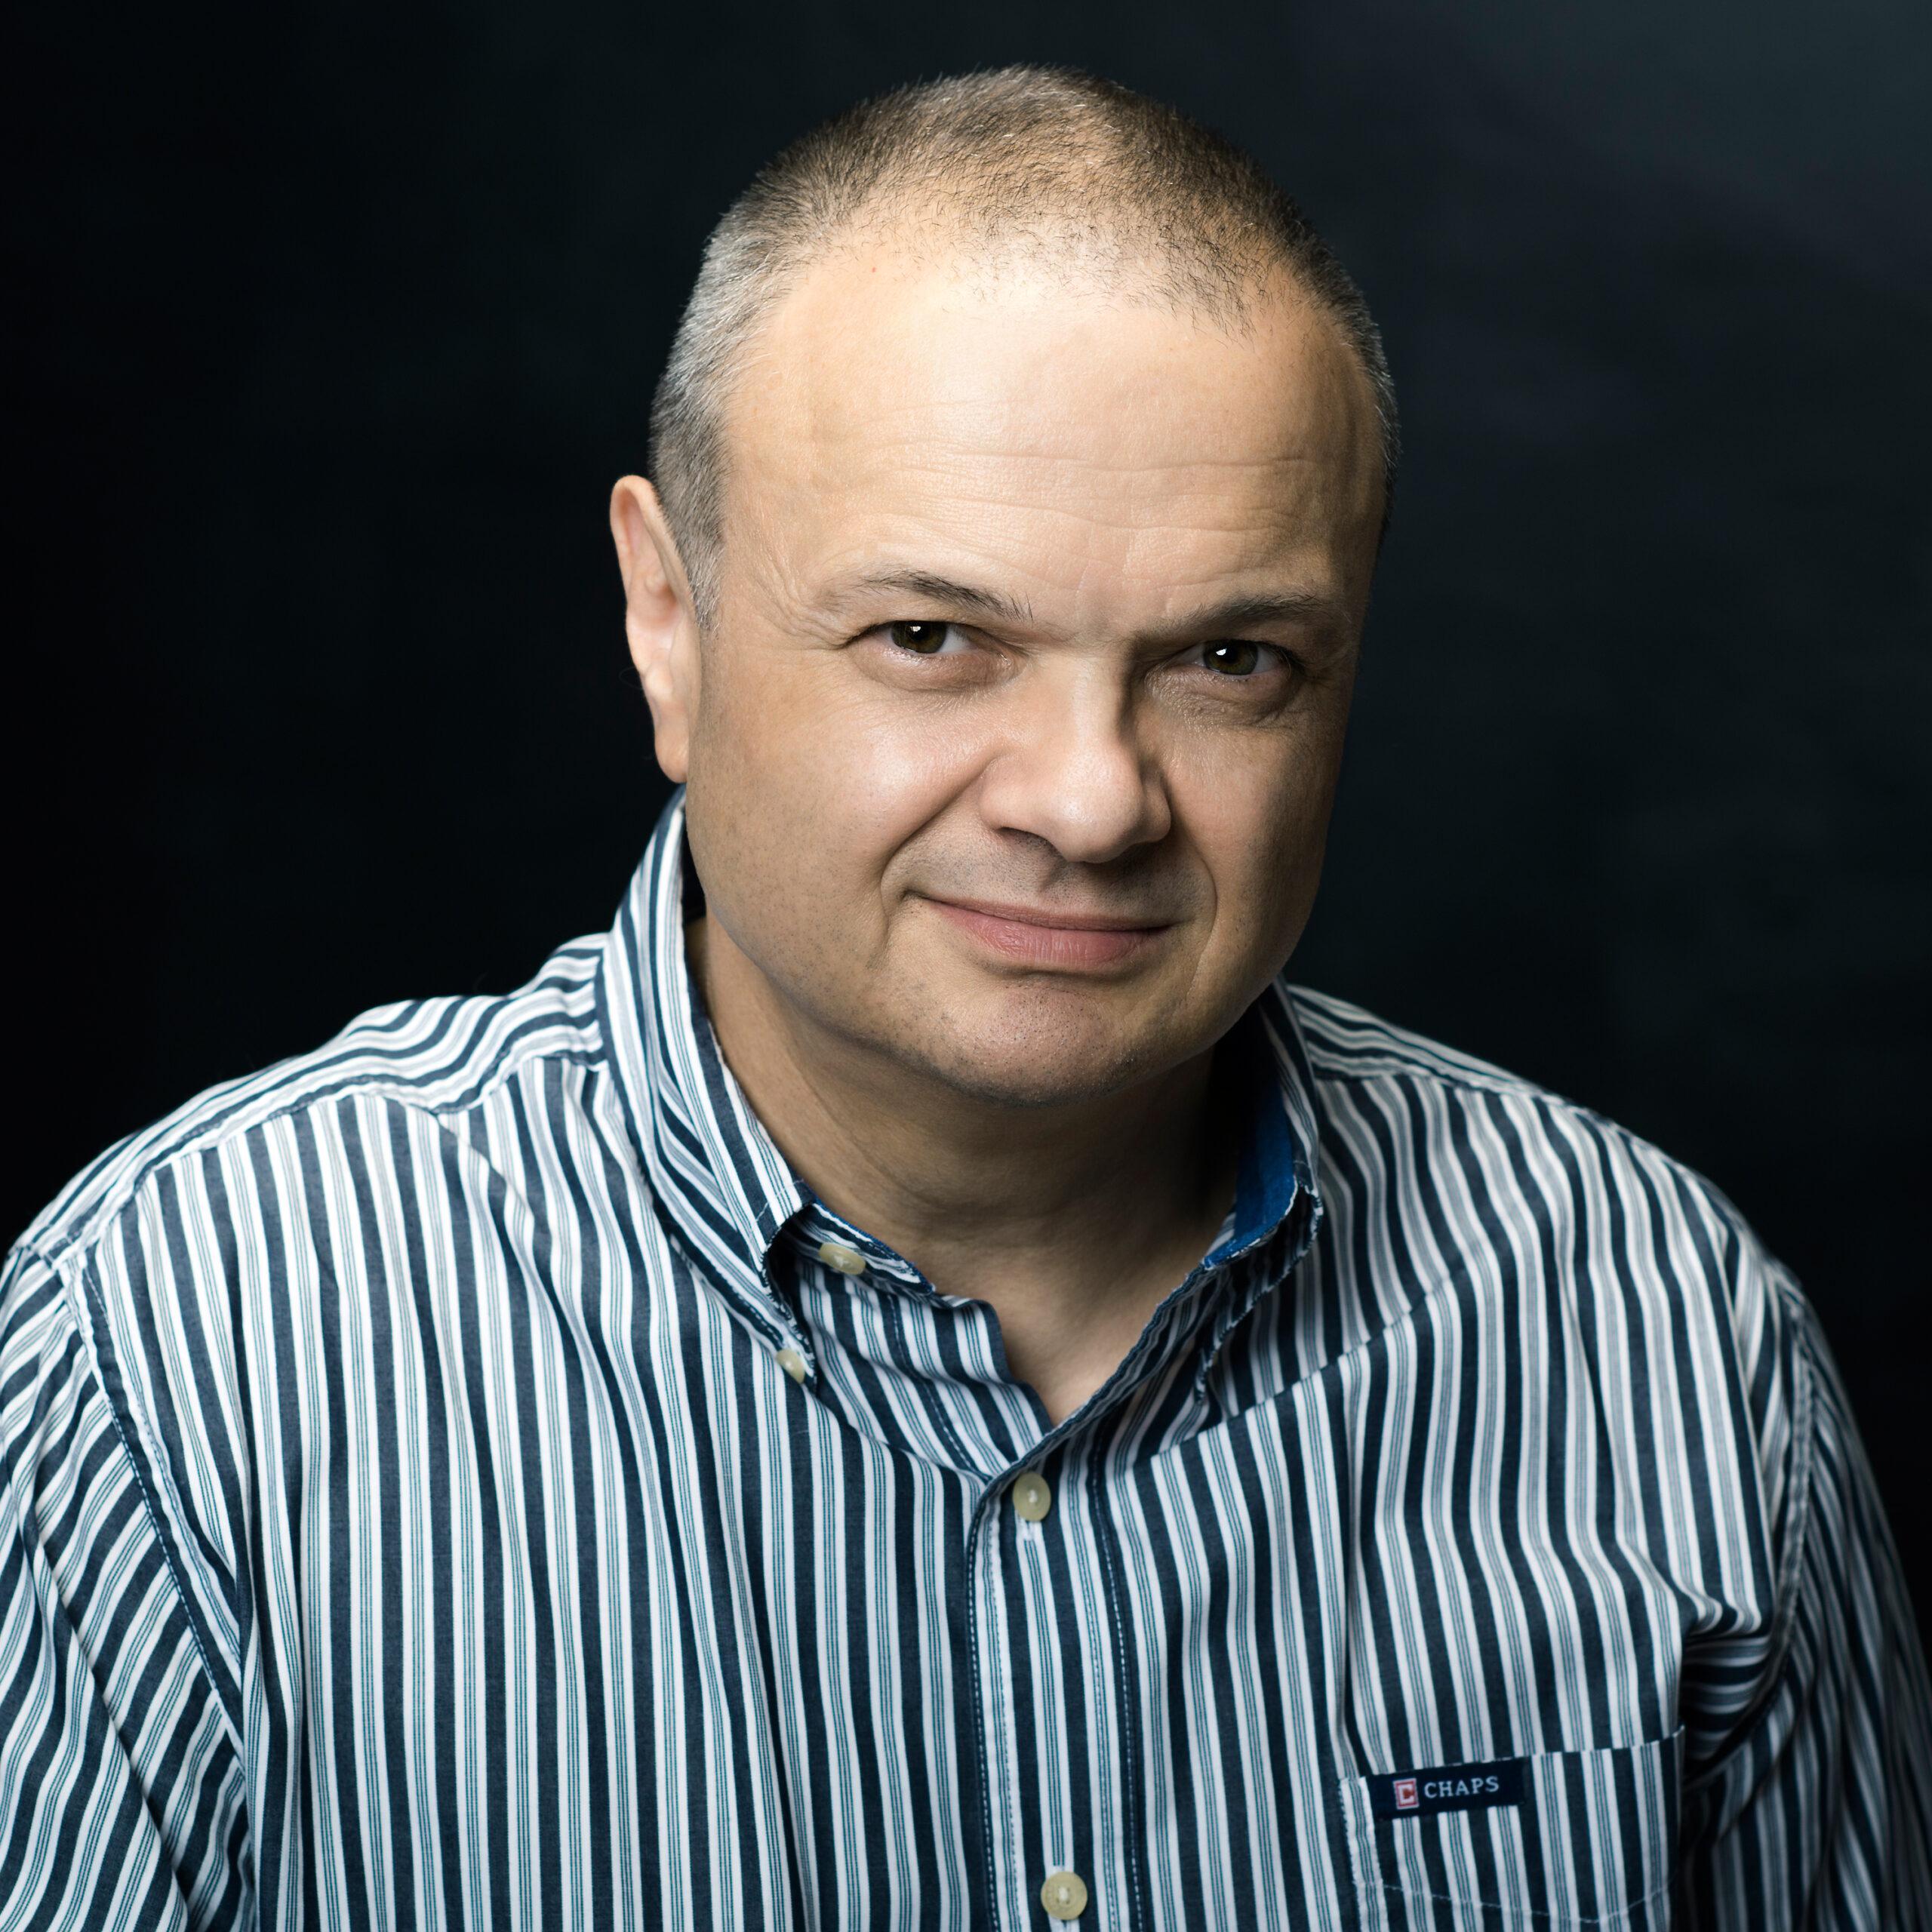 miroslaw-hardek-pion